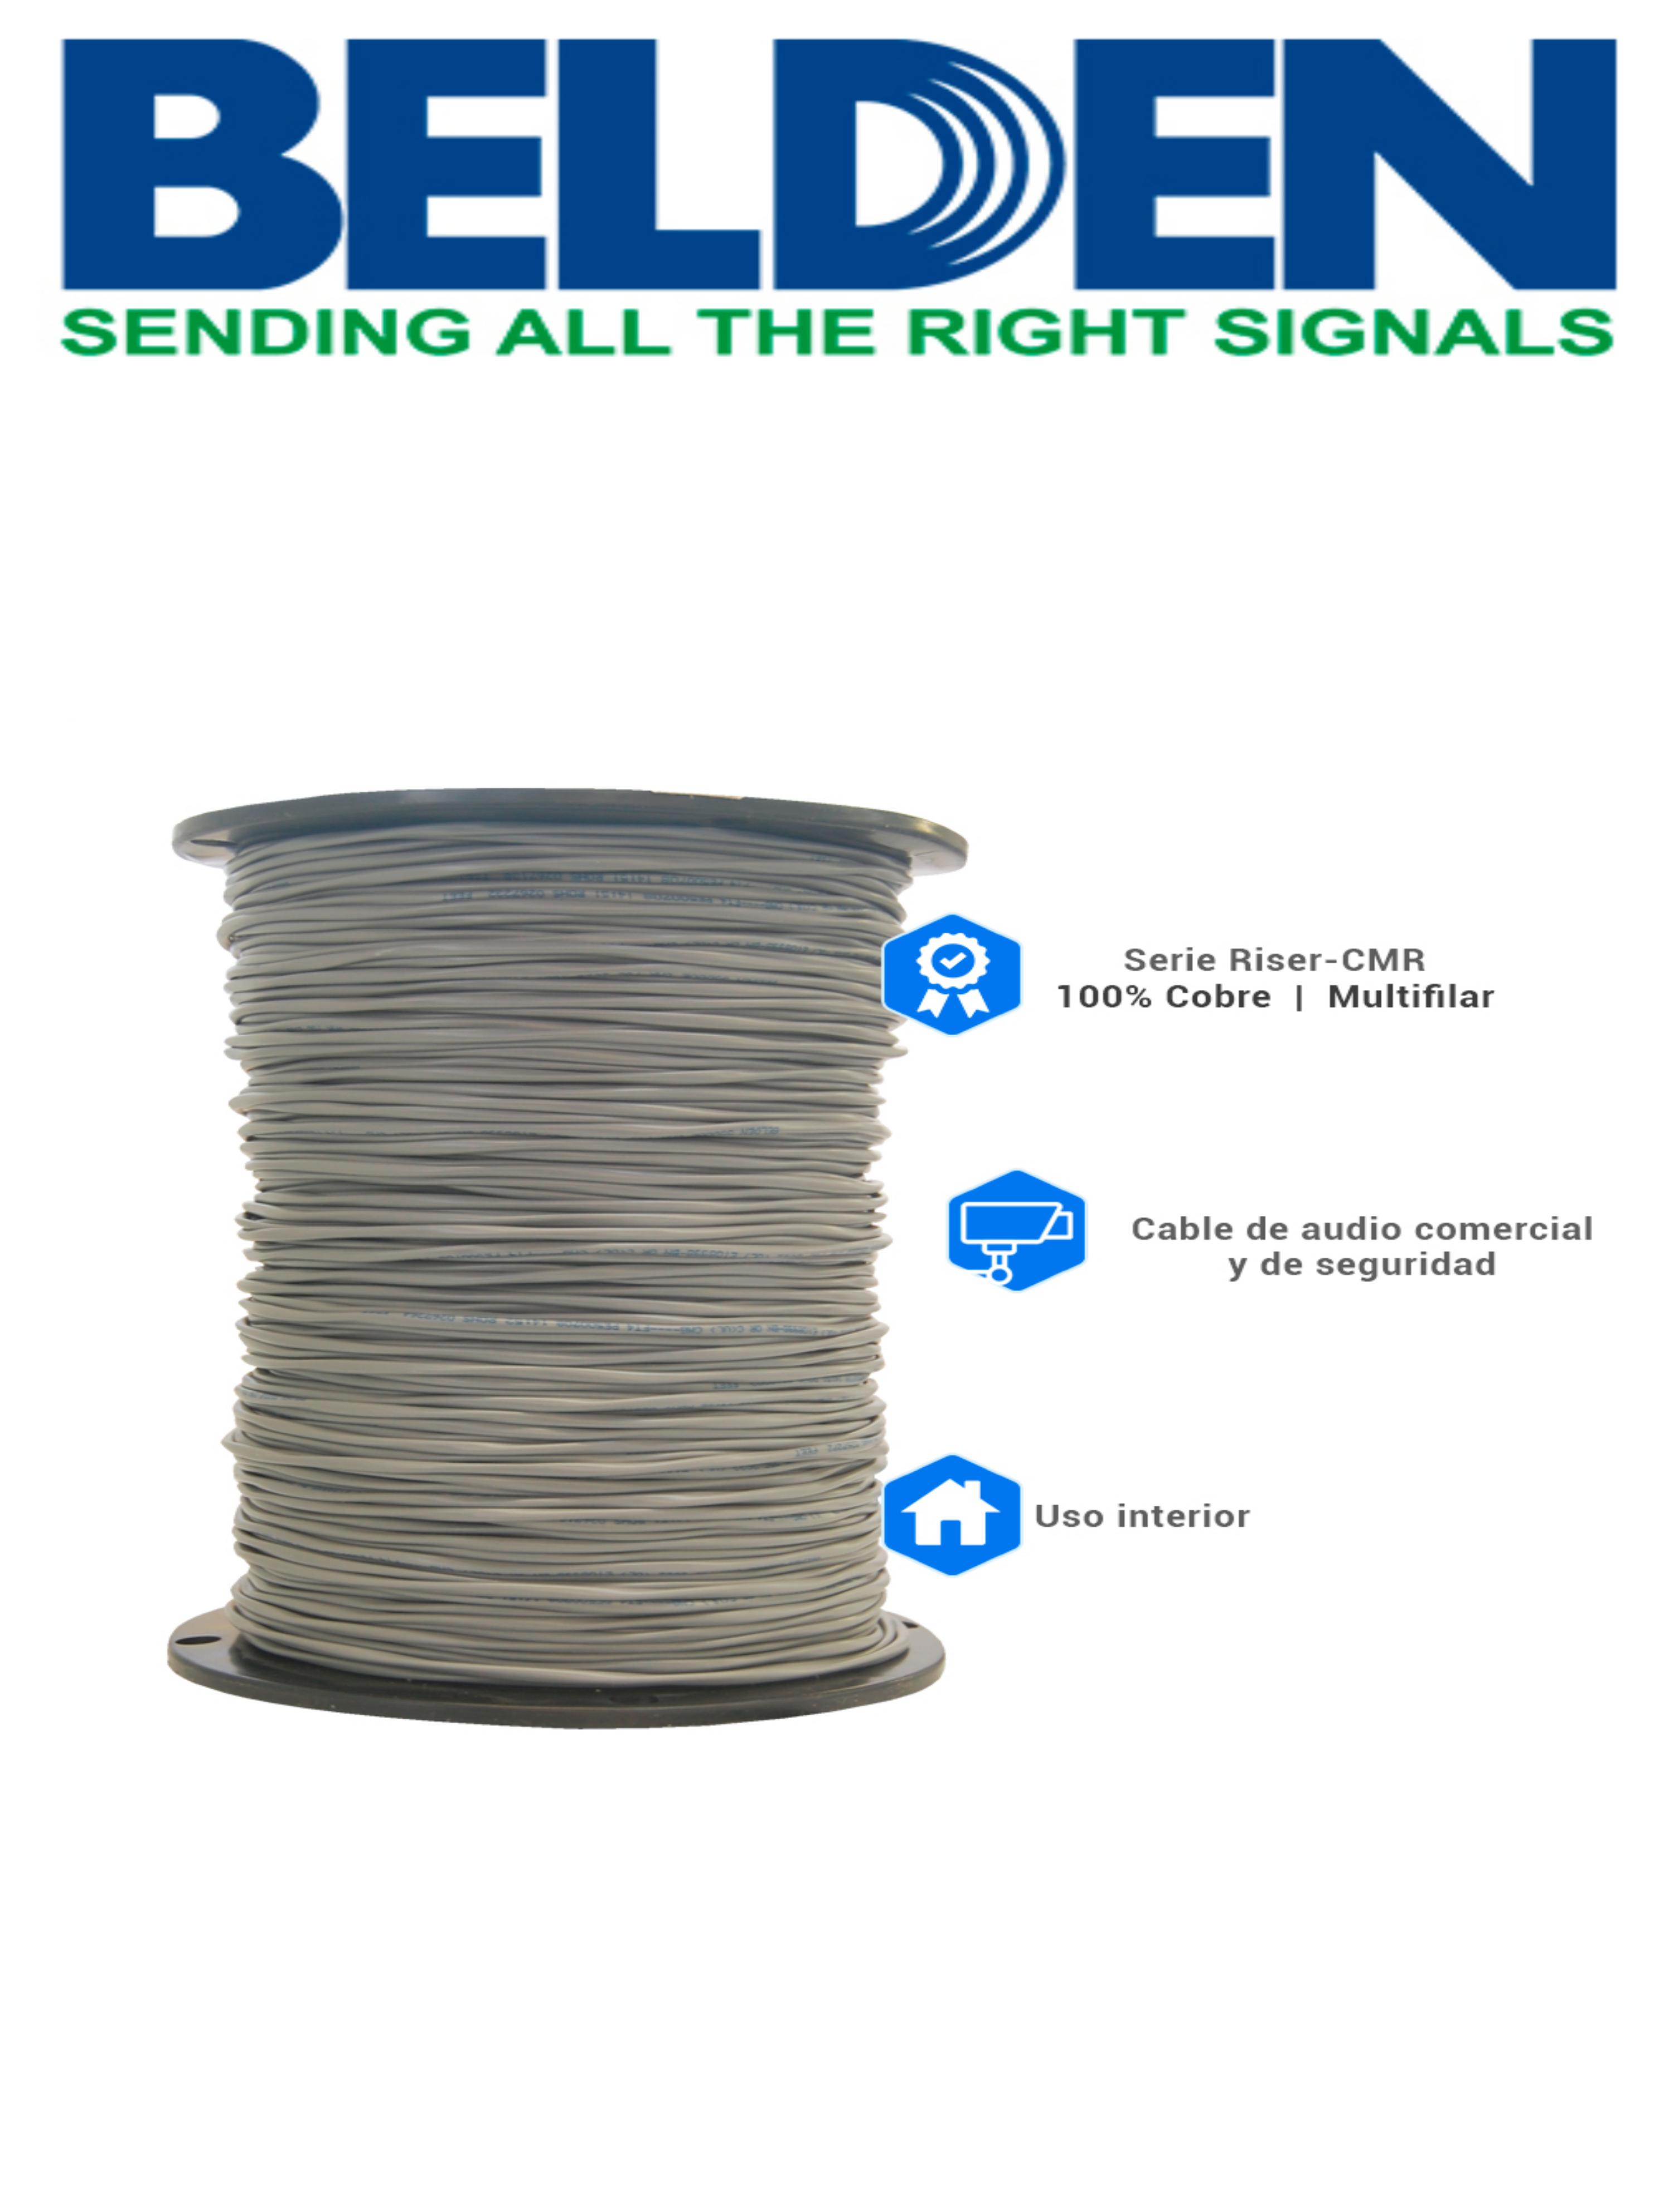 BELDEN 5300UE0081000 - Cable de alarma/ 2 Conductores / Calibre 18 AWG/ 305 Metros / Recomendable para control de acceso / Videoportero / Audio